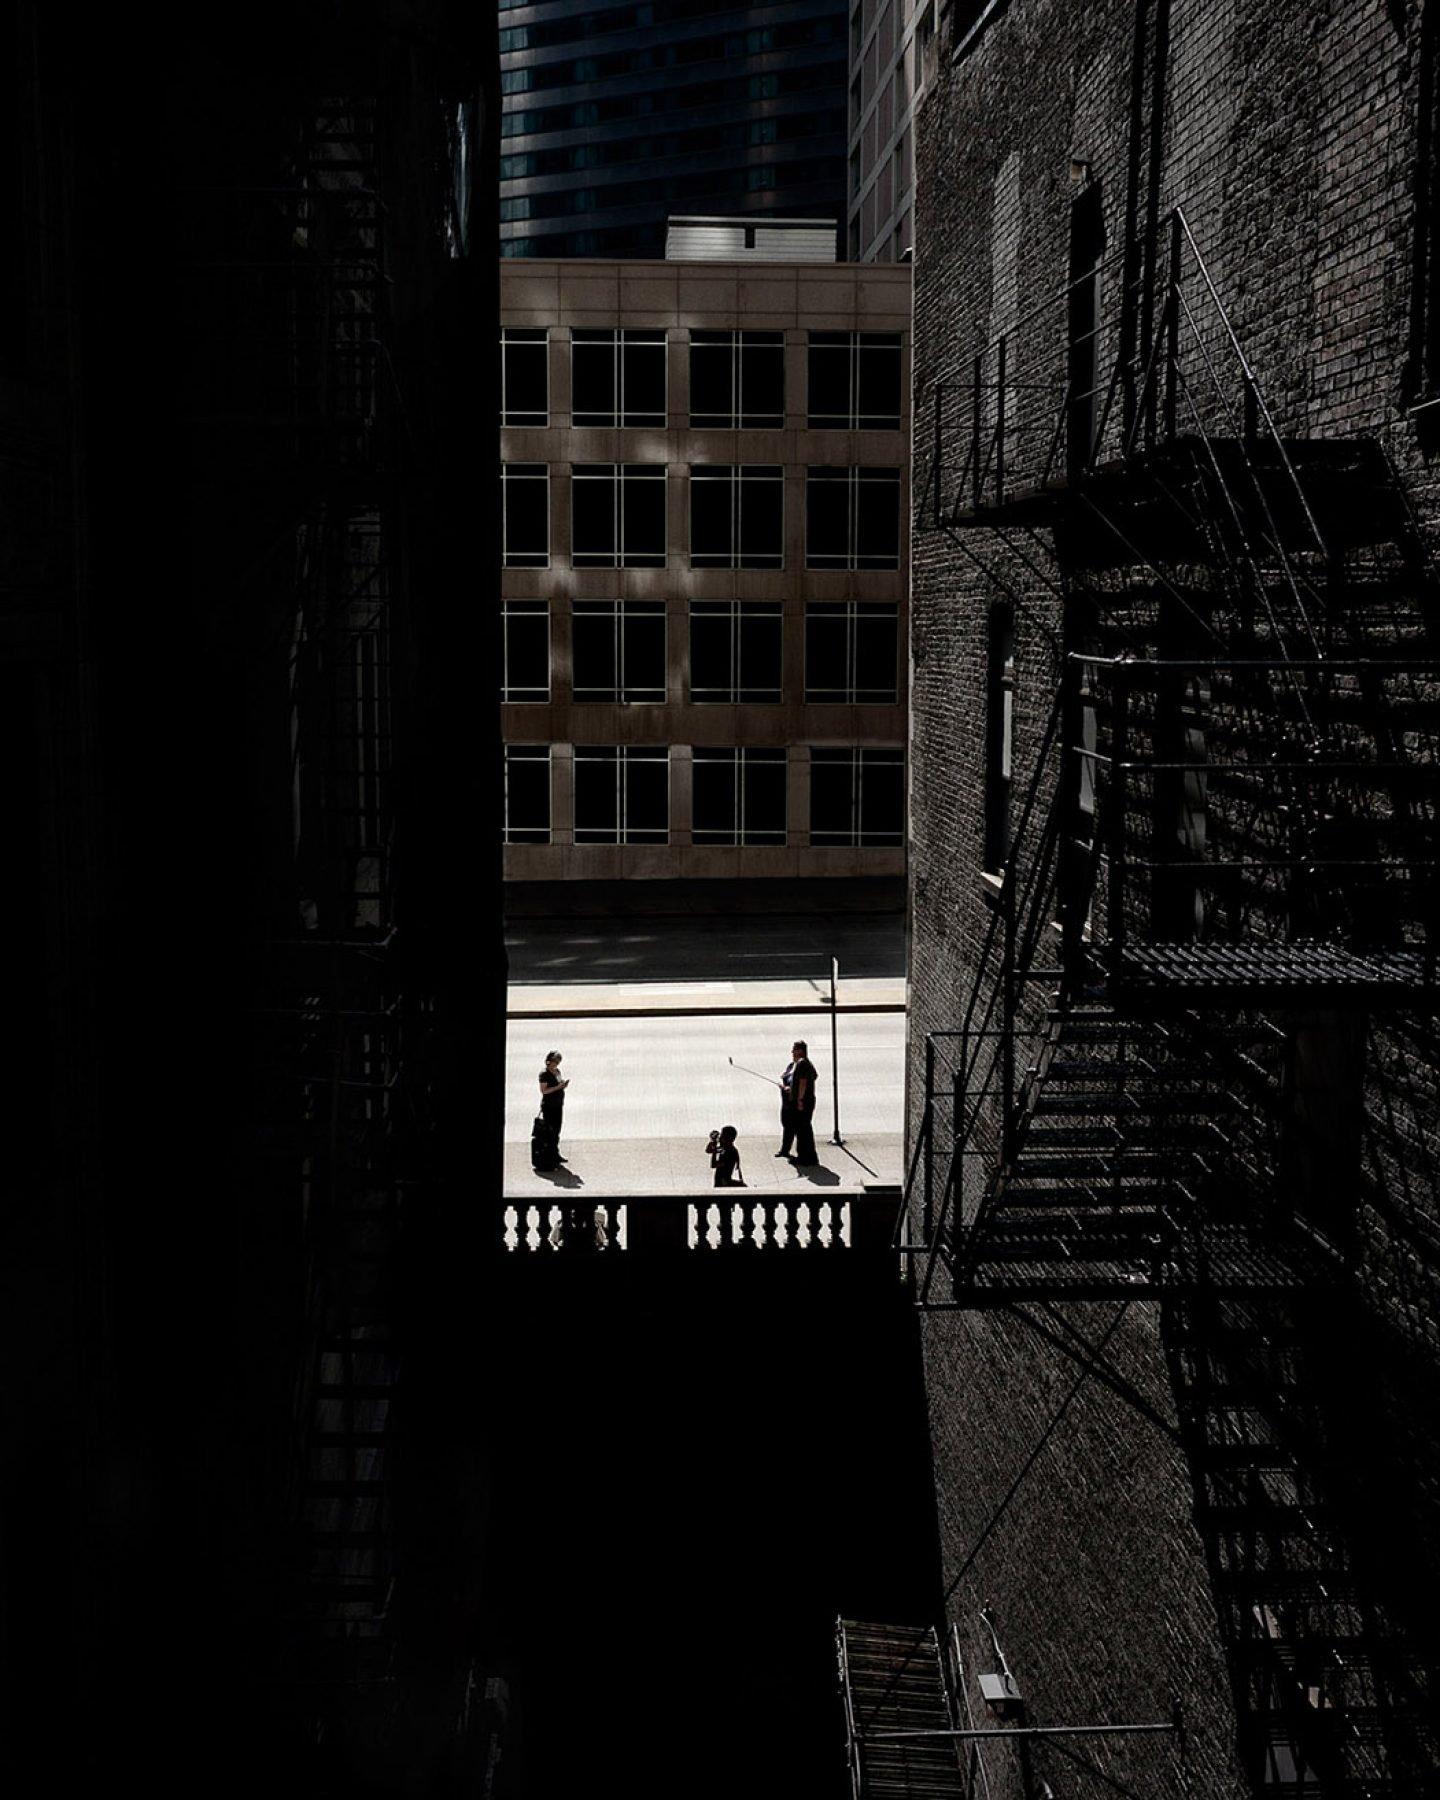 iGNANT_Photography_Clarissa_Bonet_City_Space_10